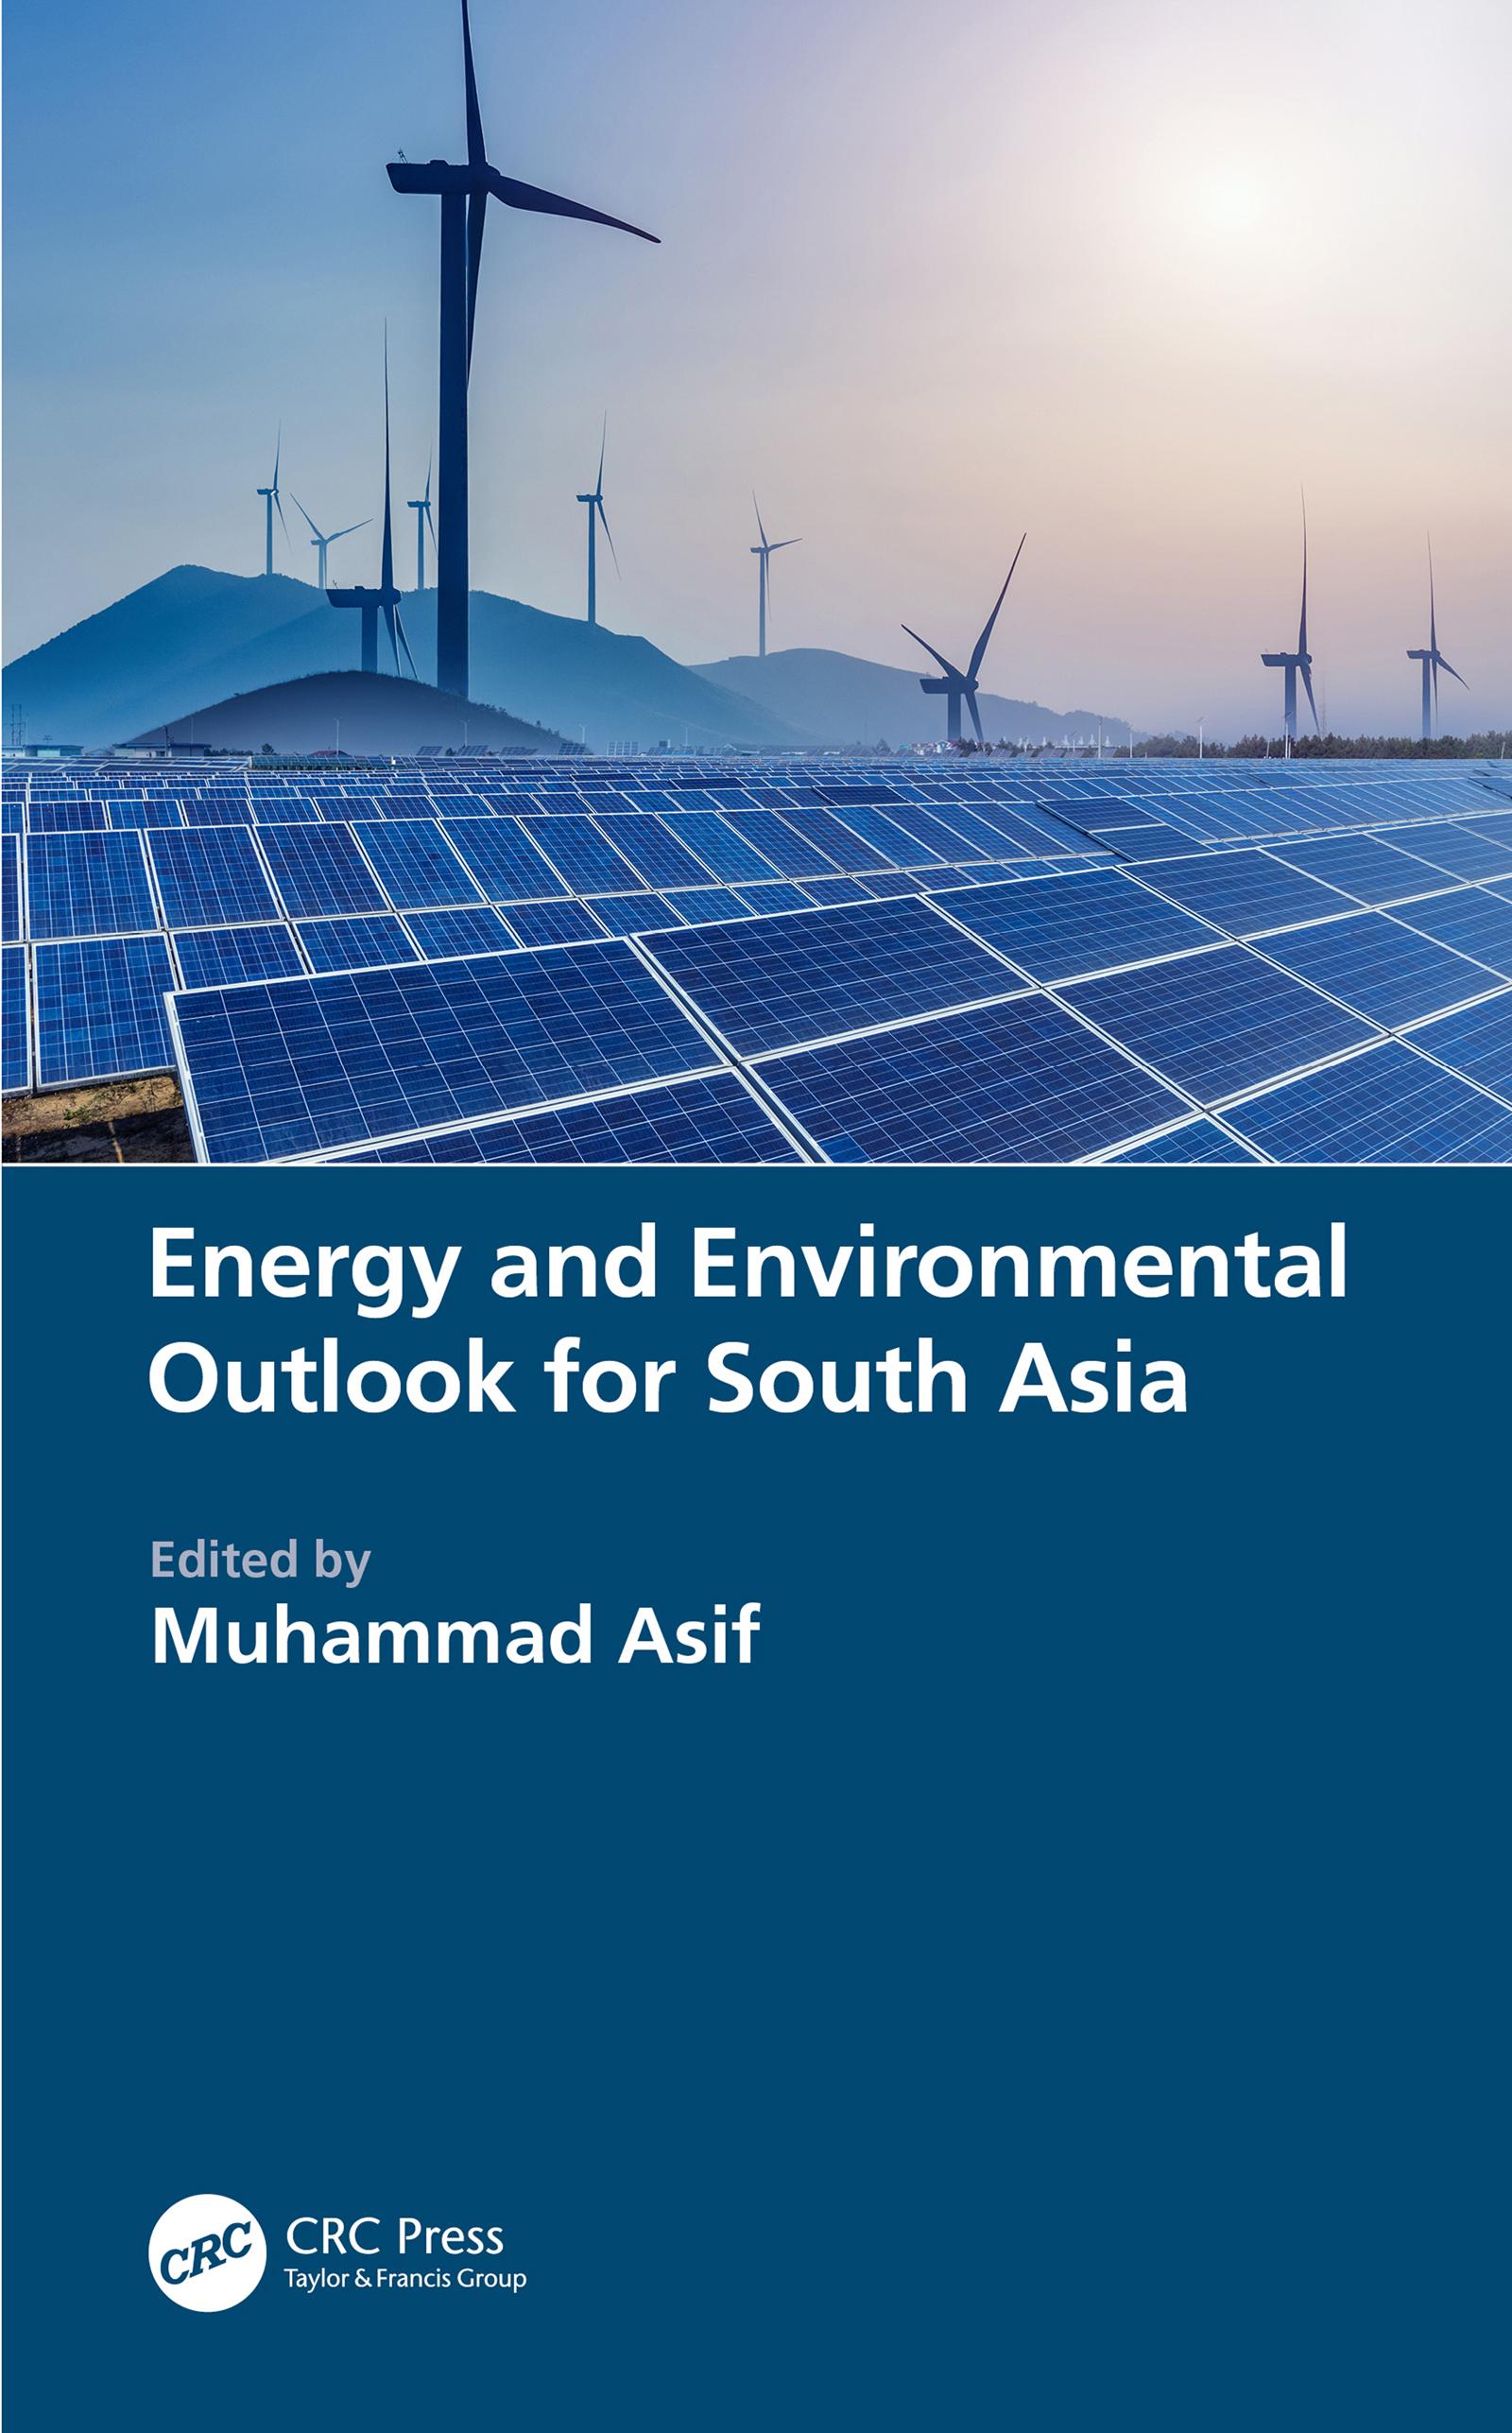 Afghanistan's Energy and Environmental Scenario